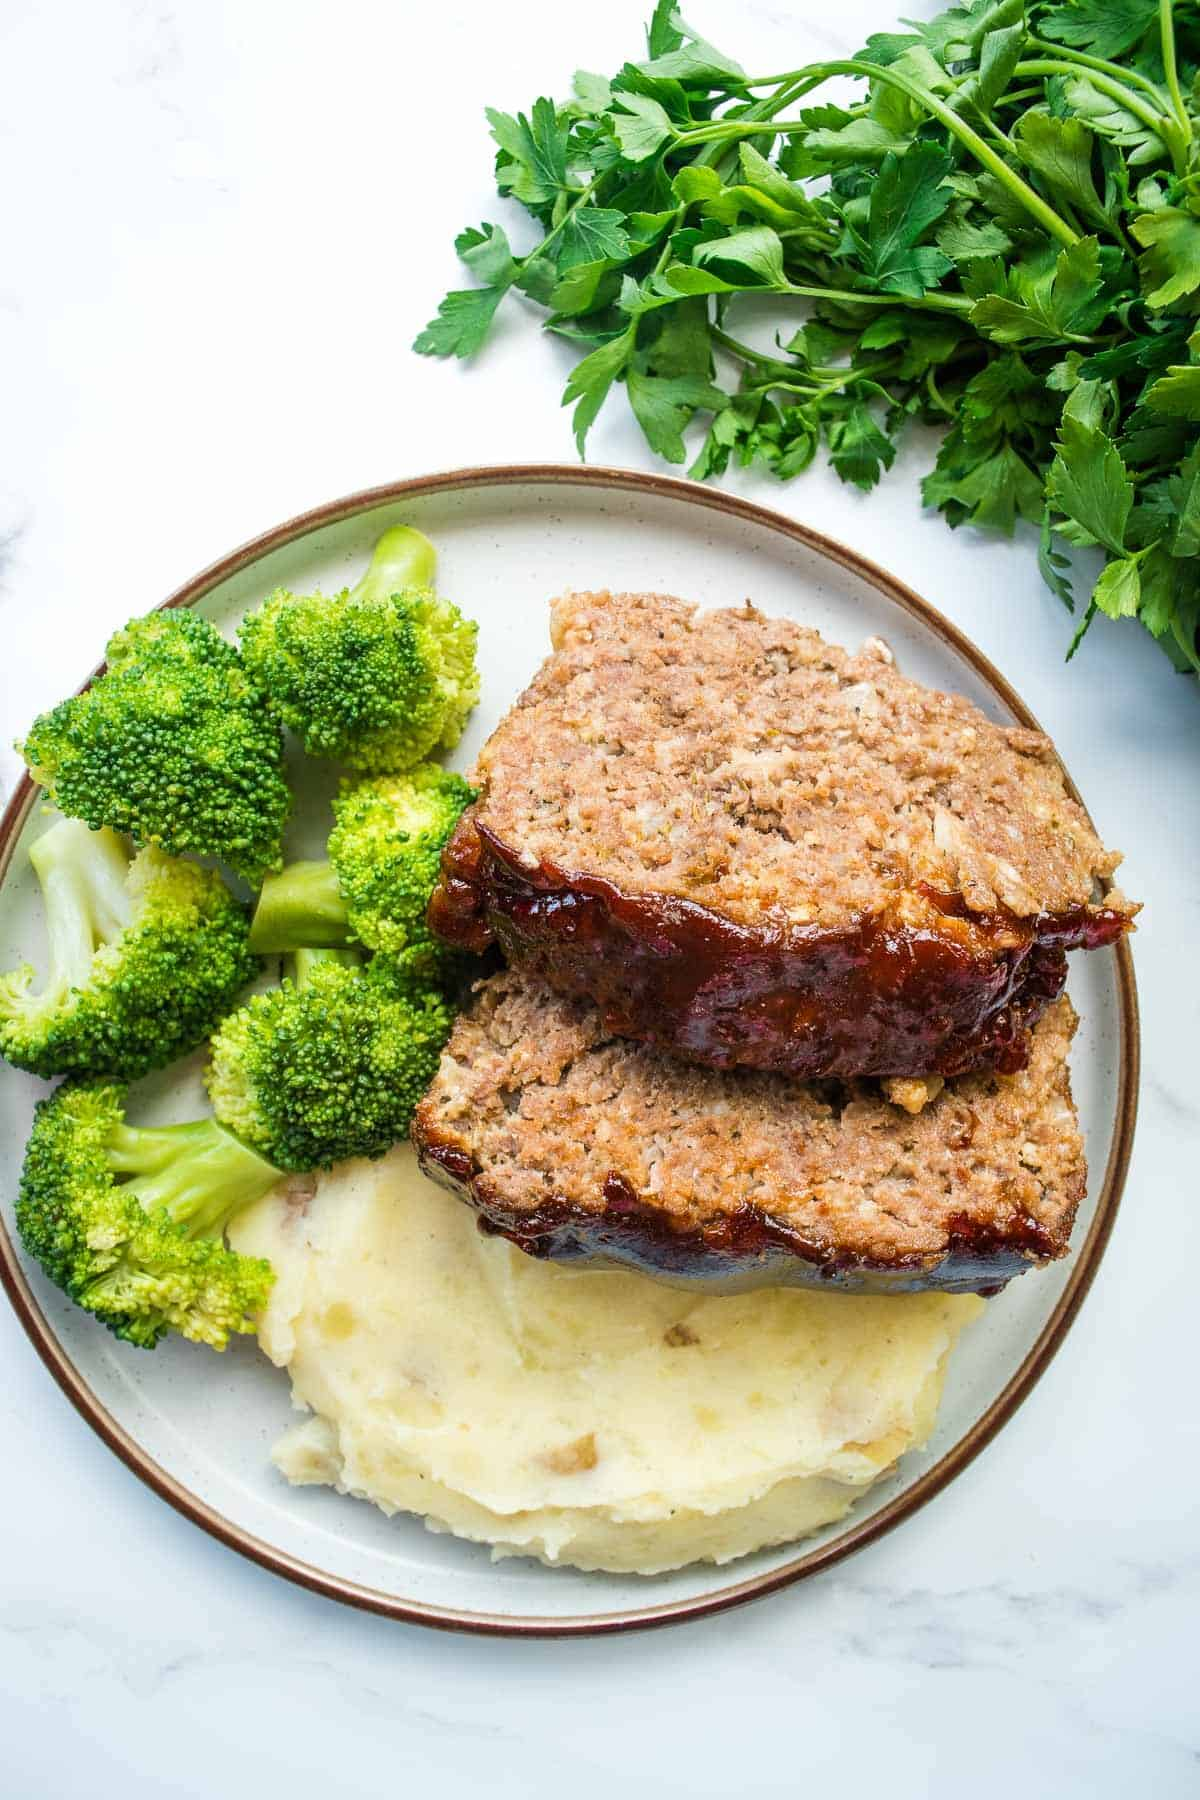 Sliced BBQ meatloaf on a plate.